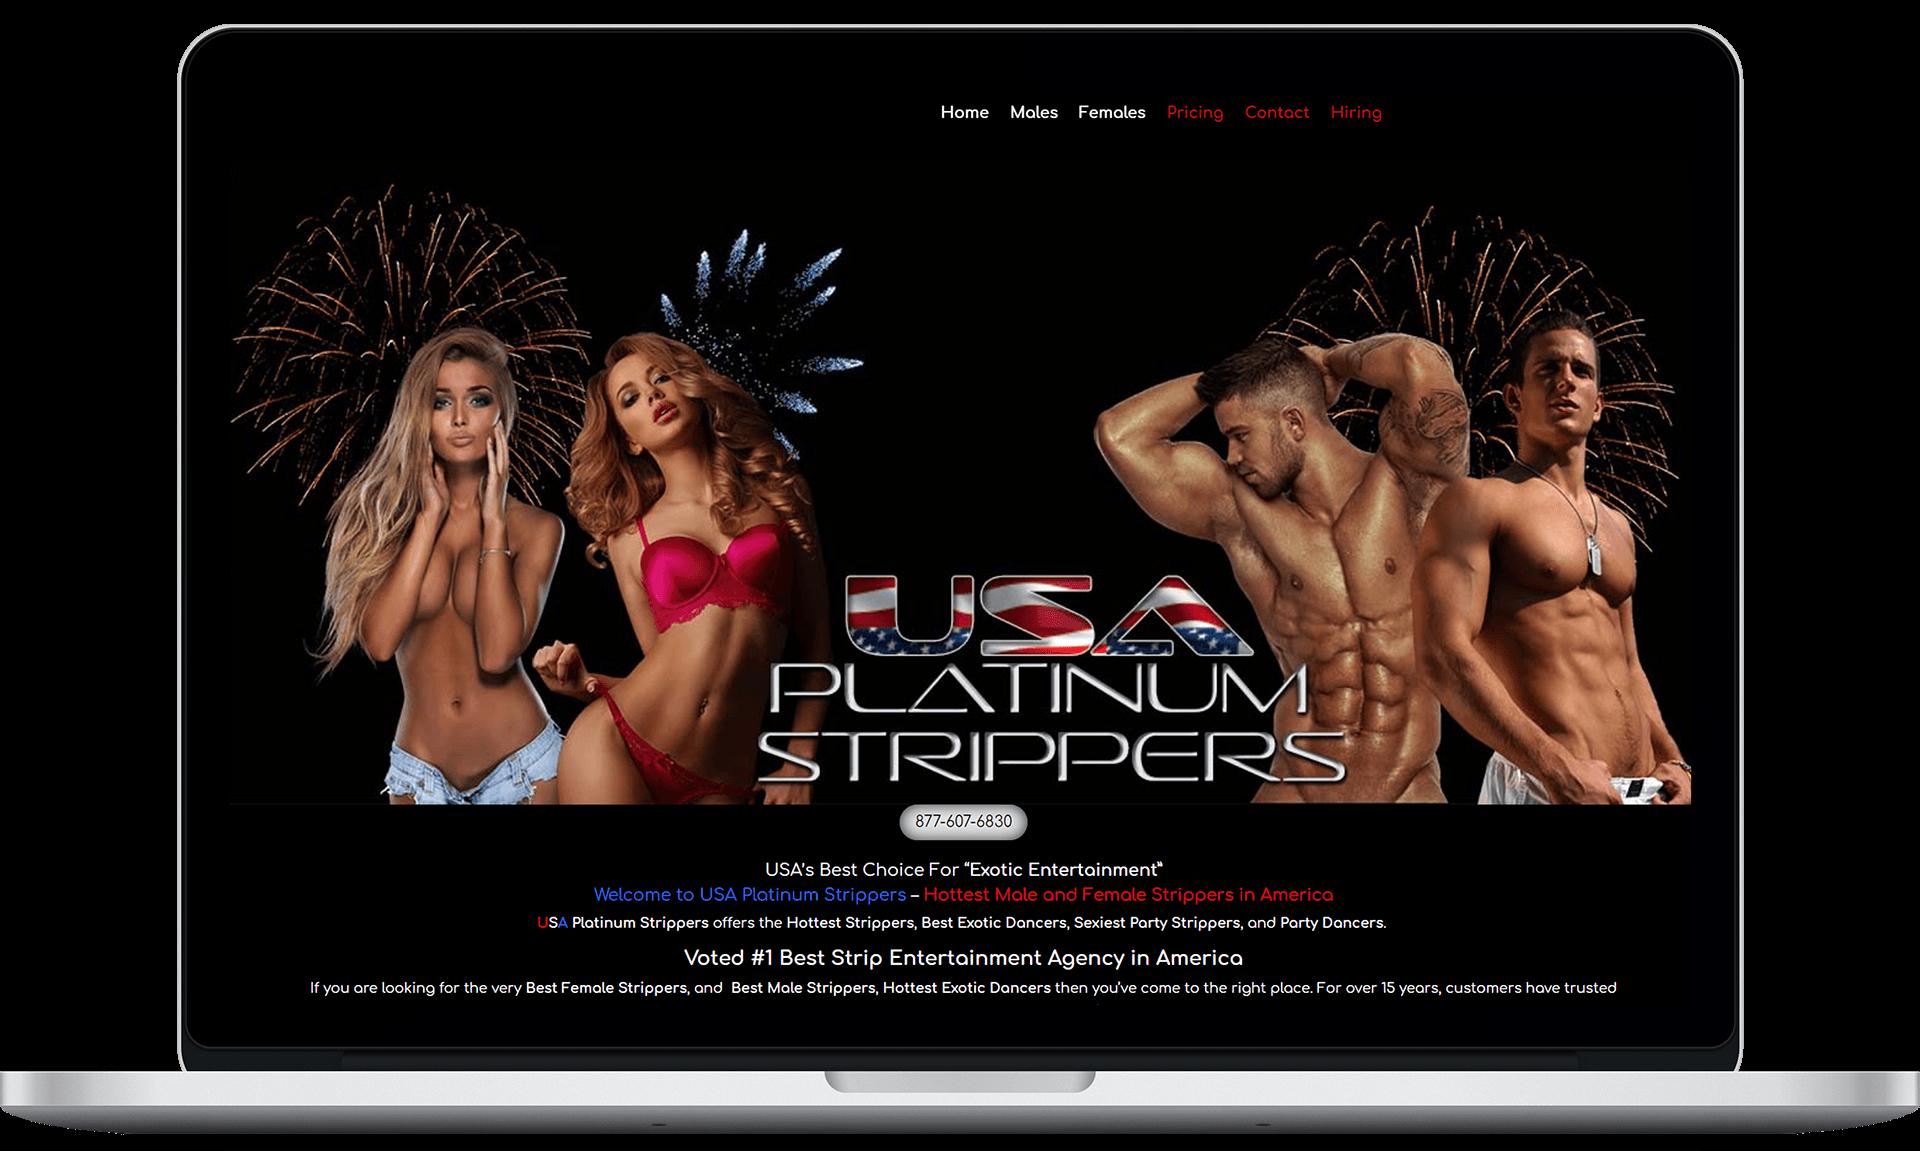 USA Platinum Strippers